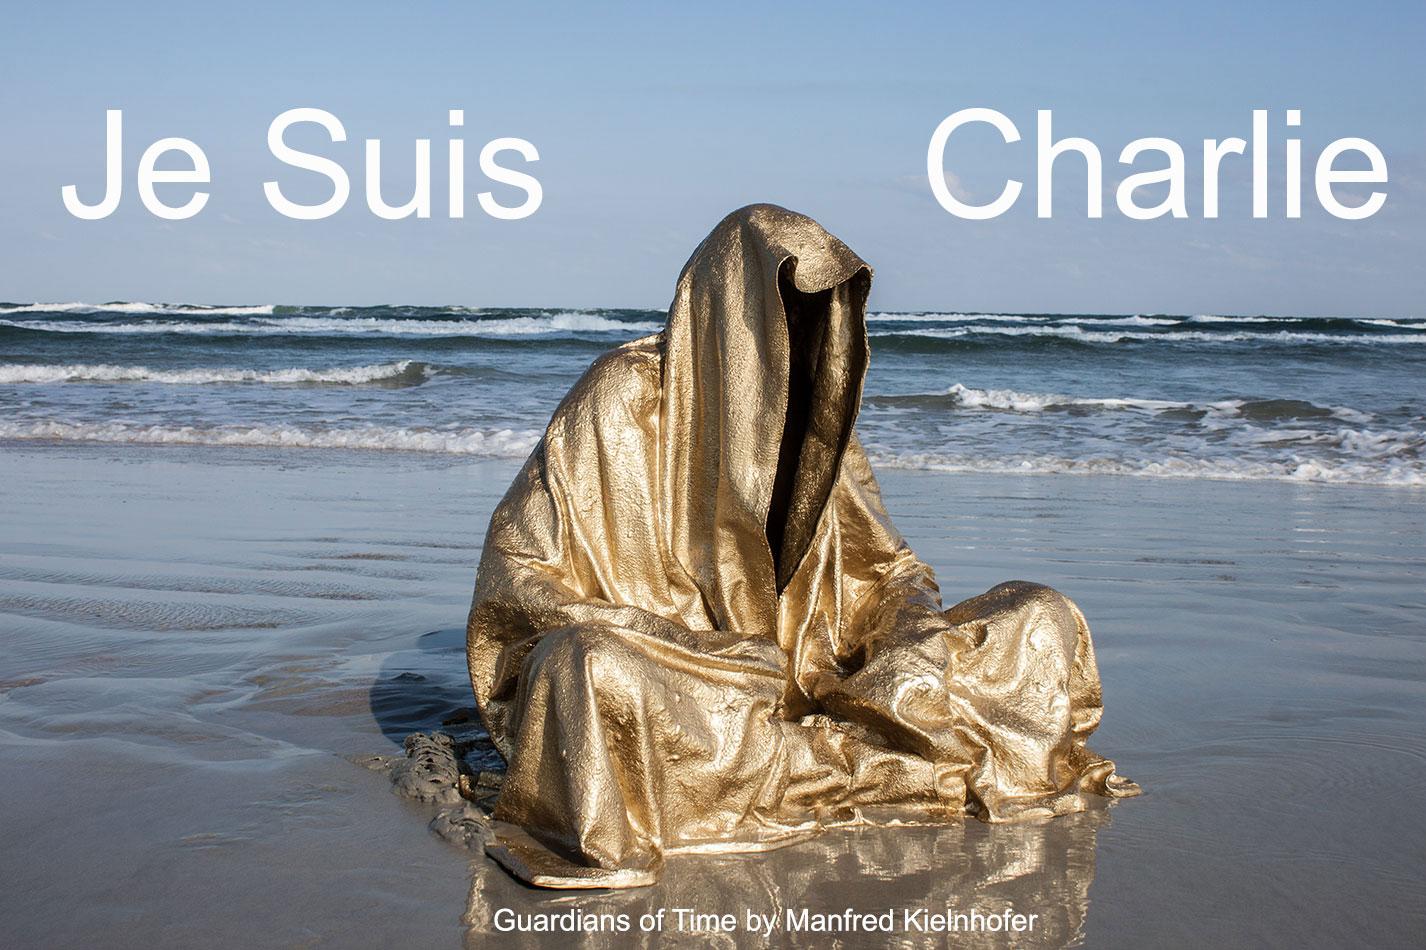 Je-Suis-Charlie-freedom-of-speech-guardians-of-time-manfred-kili-kielnhofer-contemporary-fine-art-modern-arts-design-antiques-sculpture-5207